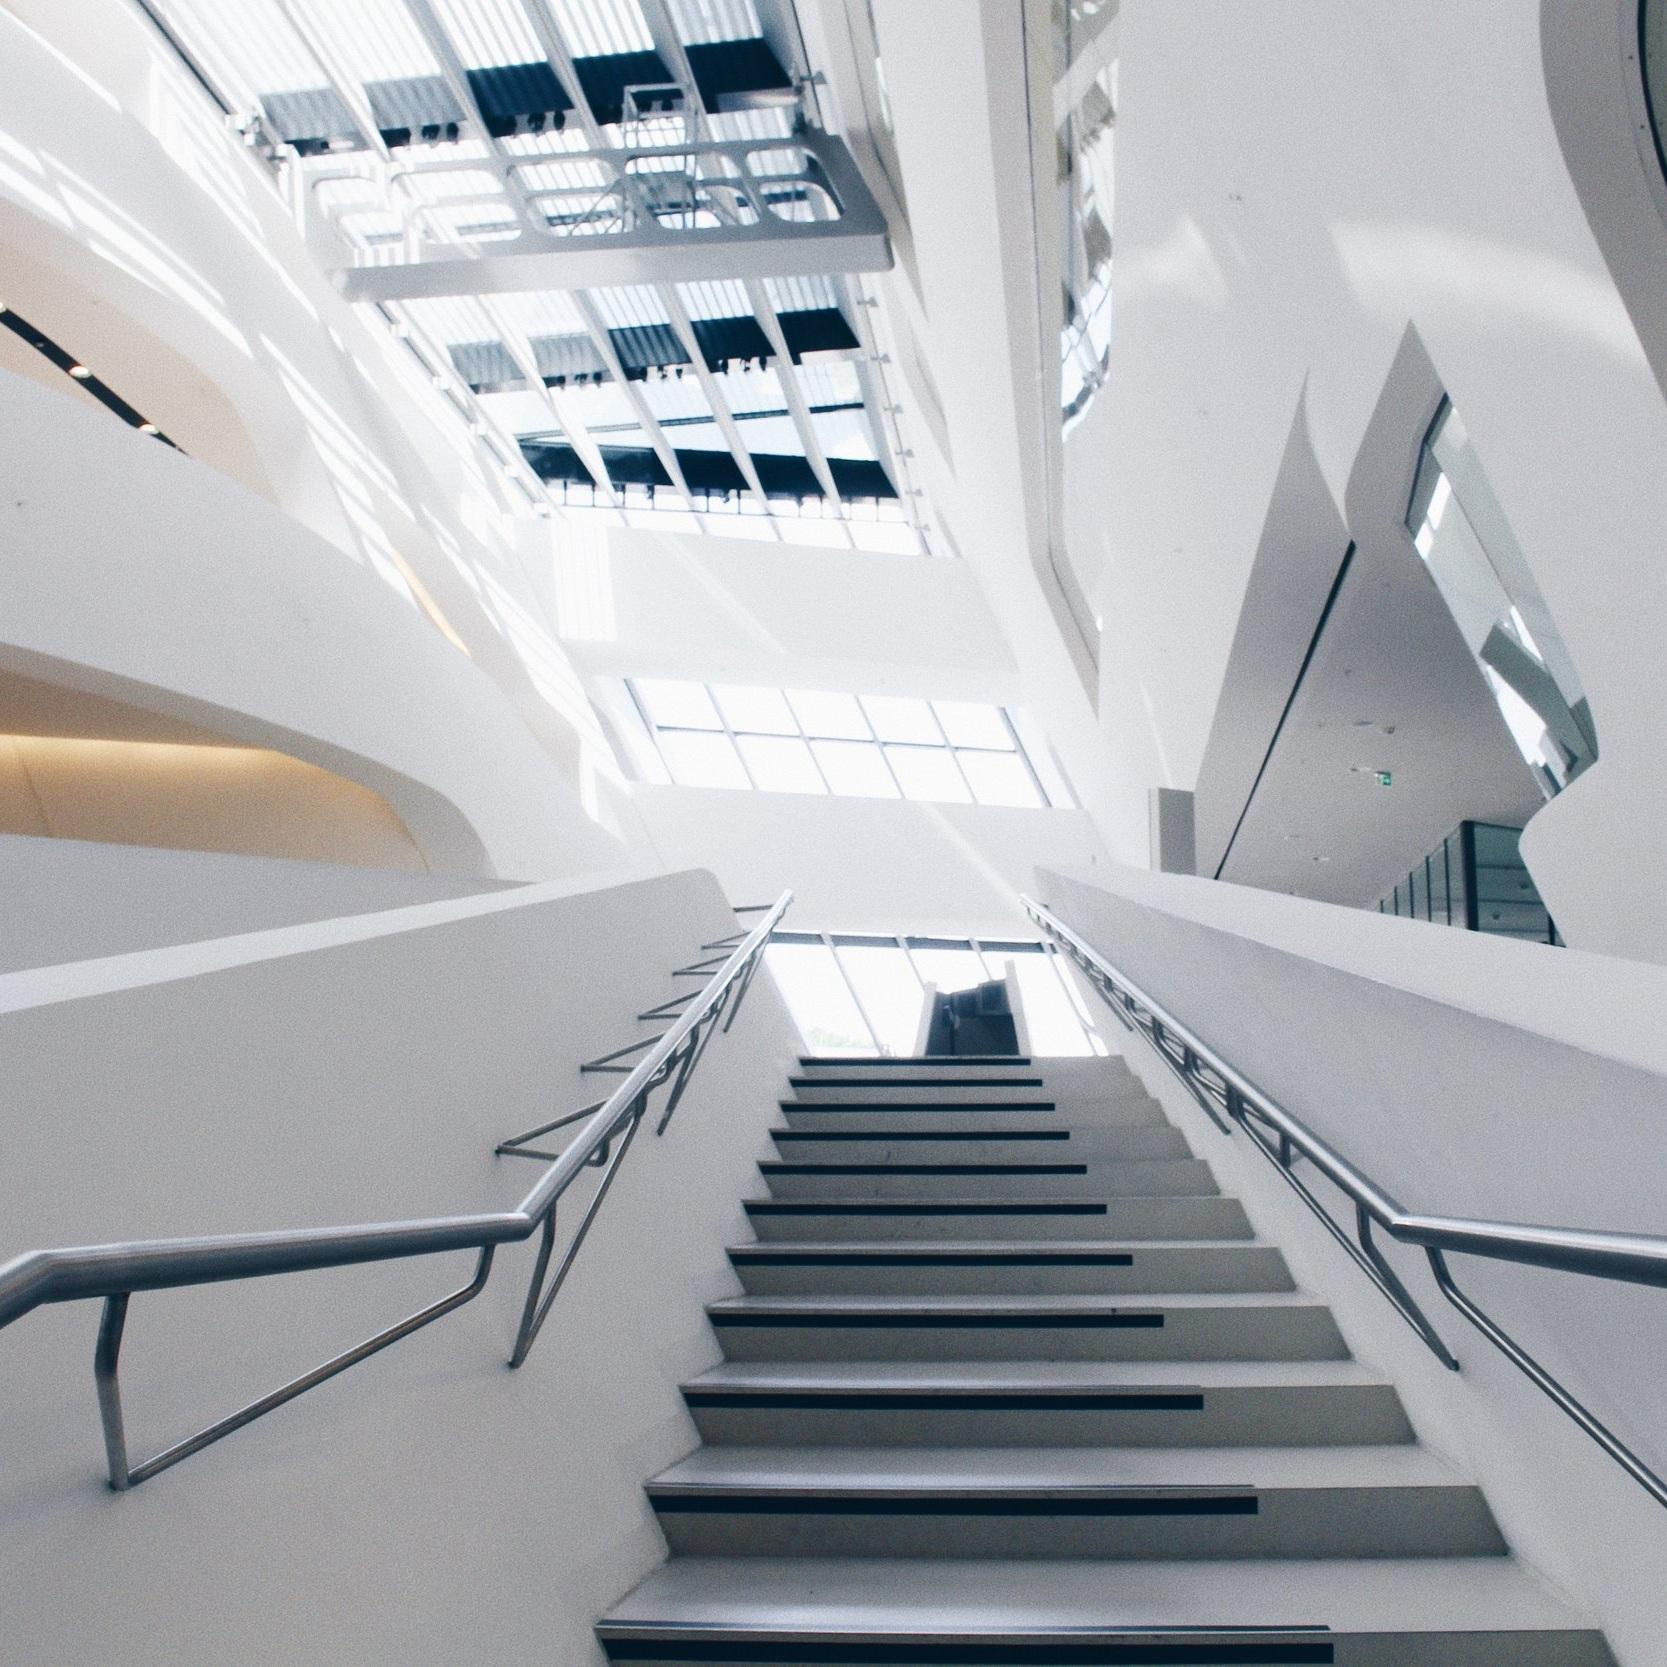 architectural-design-architecture-building-340151.jpg